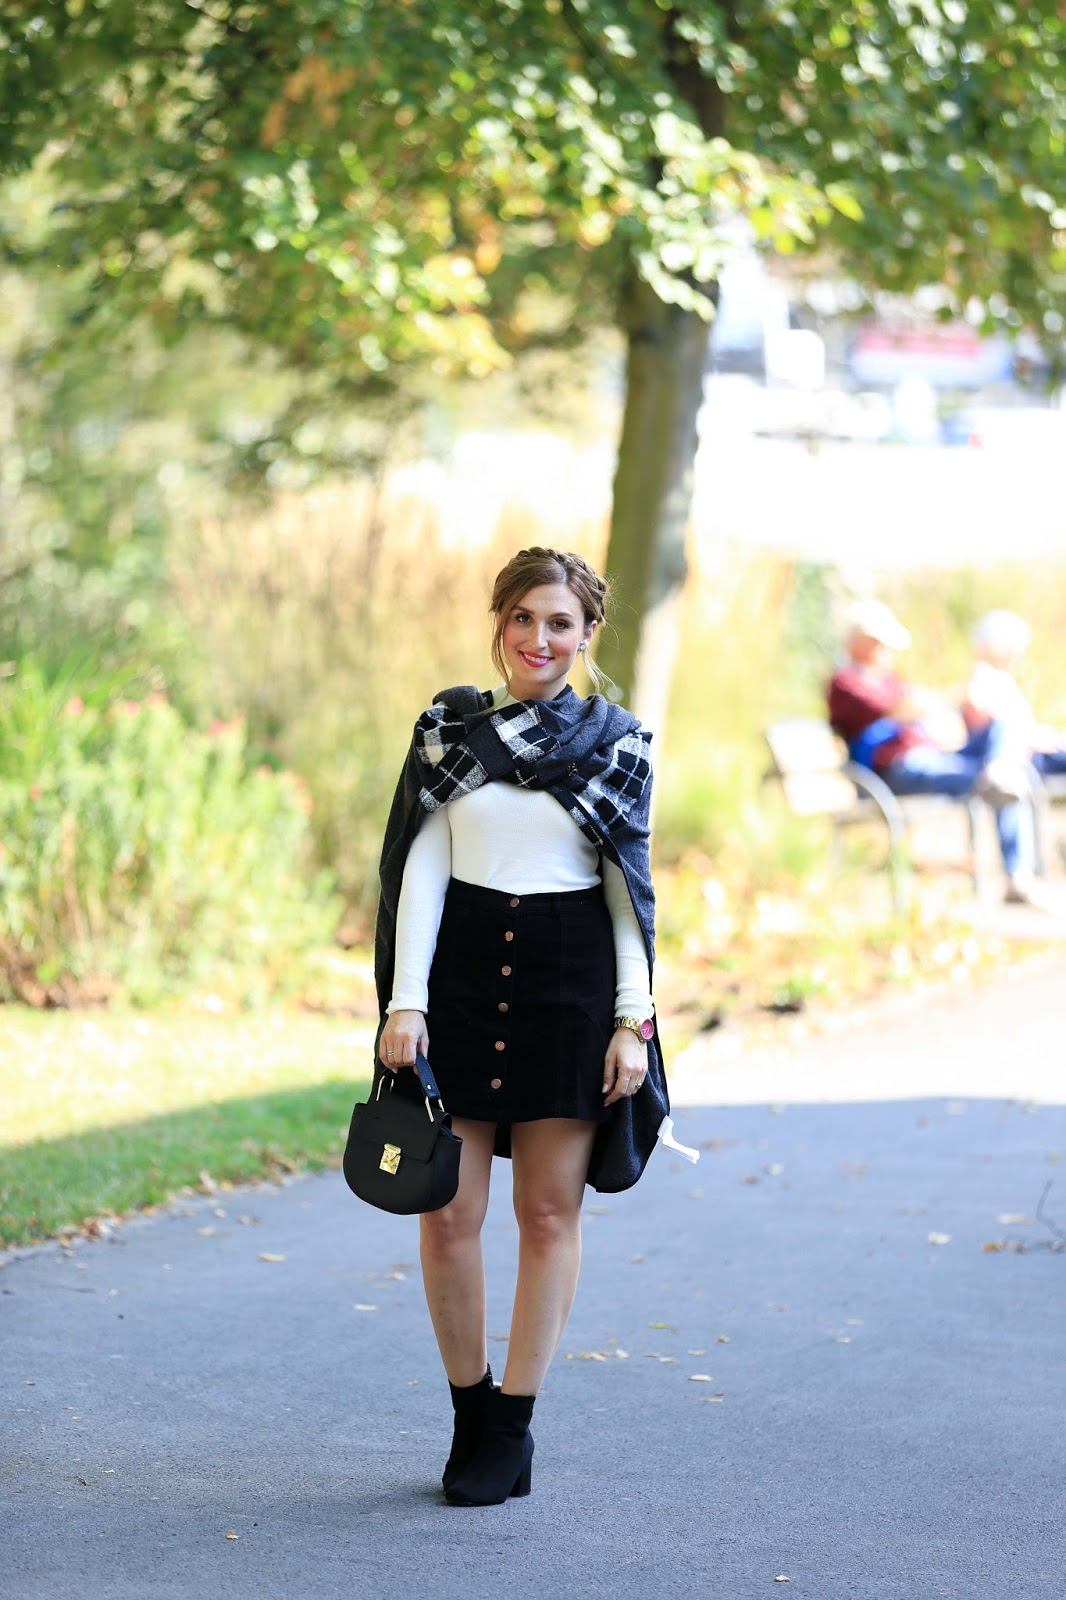 Minkpink.de-MTZ-Blogger-Frankfurt-Umstyling-Shopping-fashionstylebyjohanna-Blog-Outfit-Fashionblogger-Fashionblogger FrankfurtStreetstylLederjacke Blogger